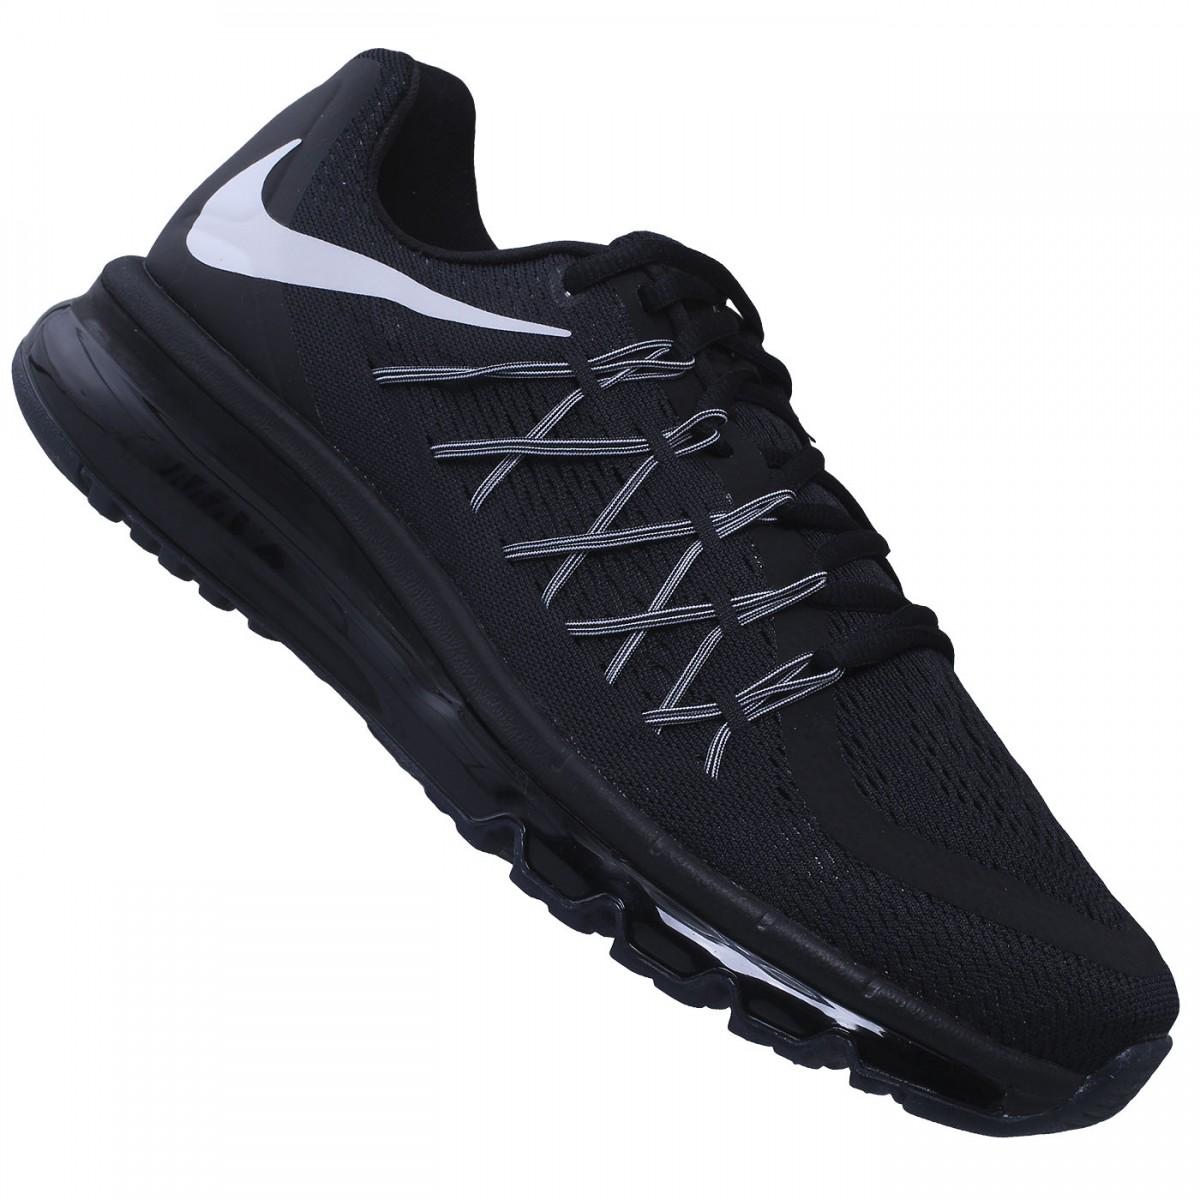 half off e01a2 e0e0e Tênis Nike Air Max 2015 - Masculino   Treino e Corrida